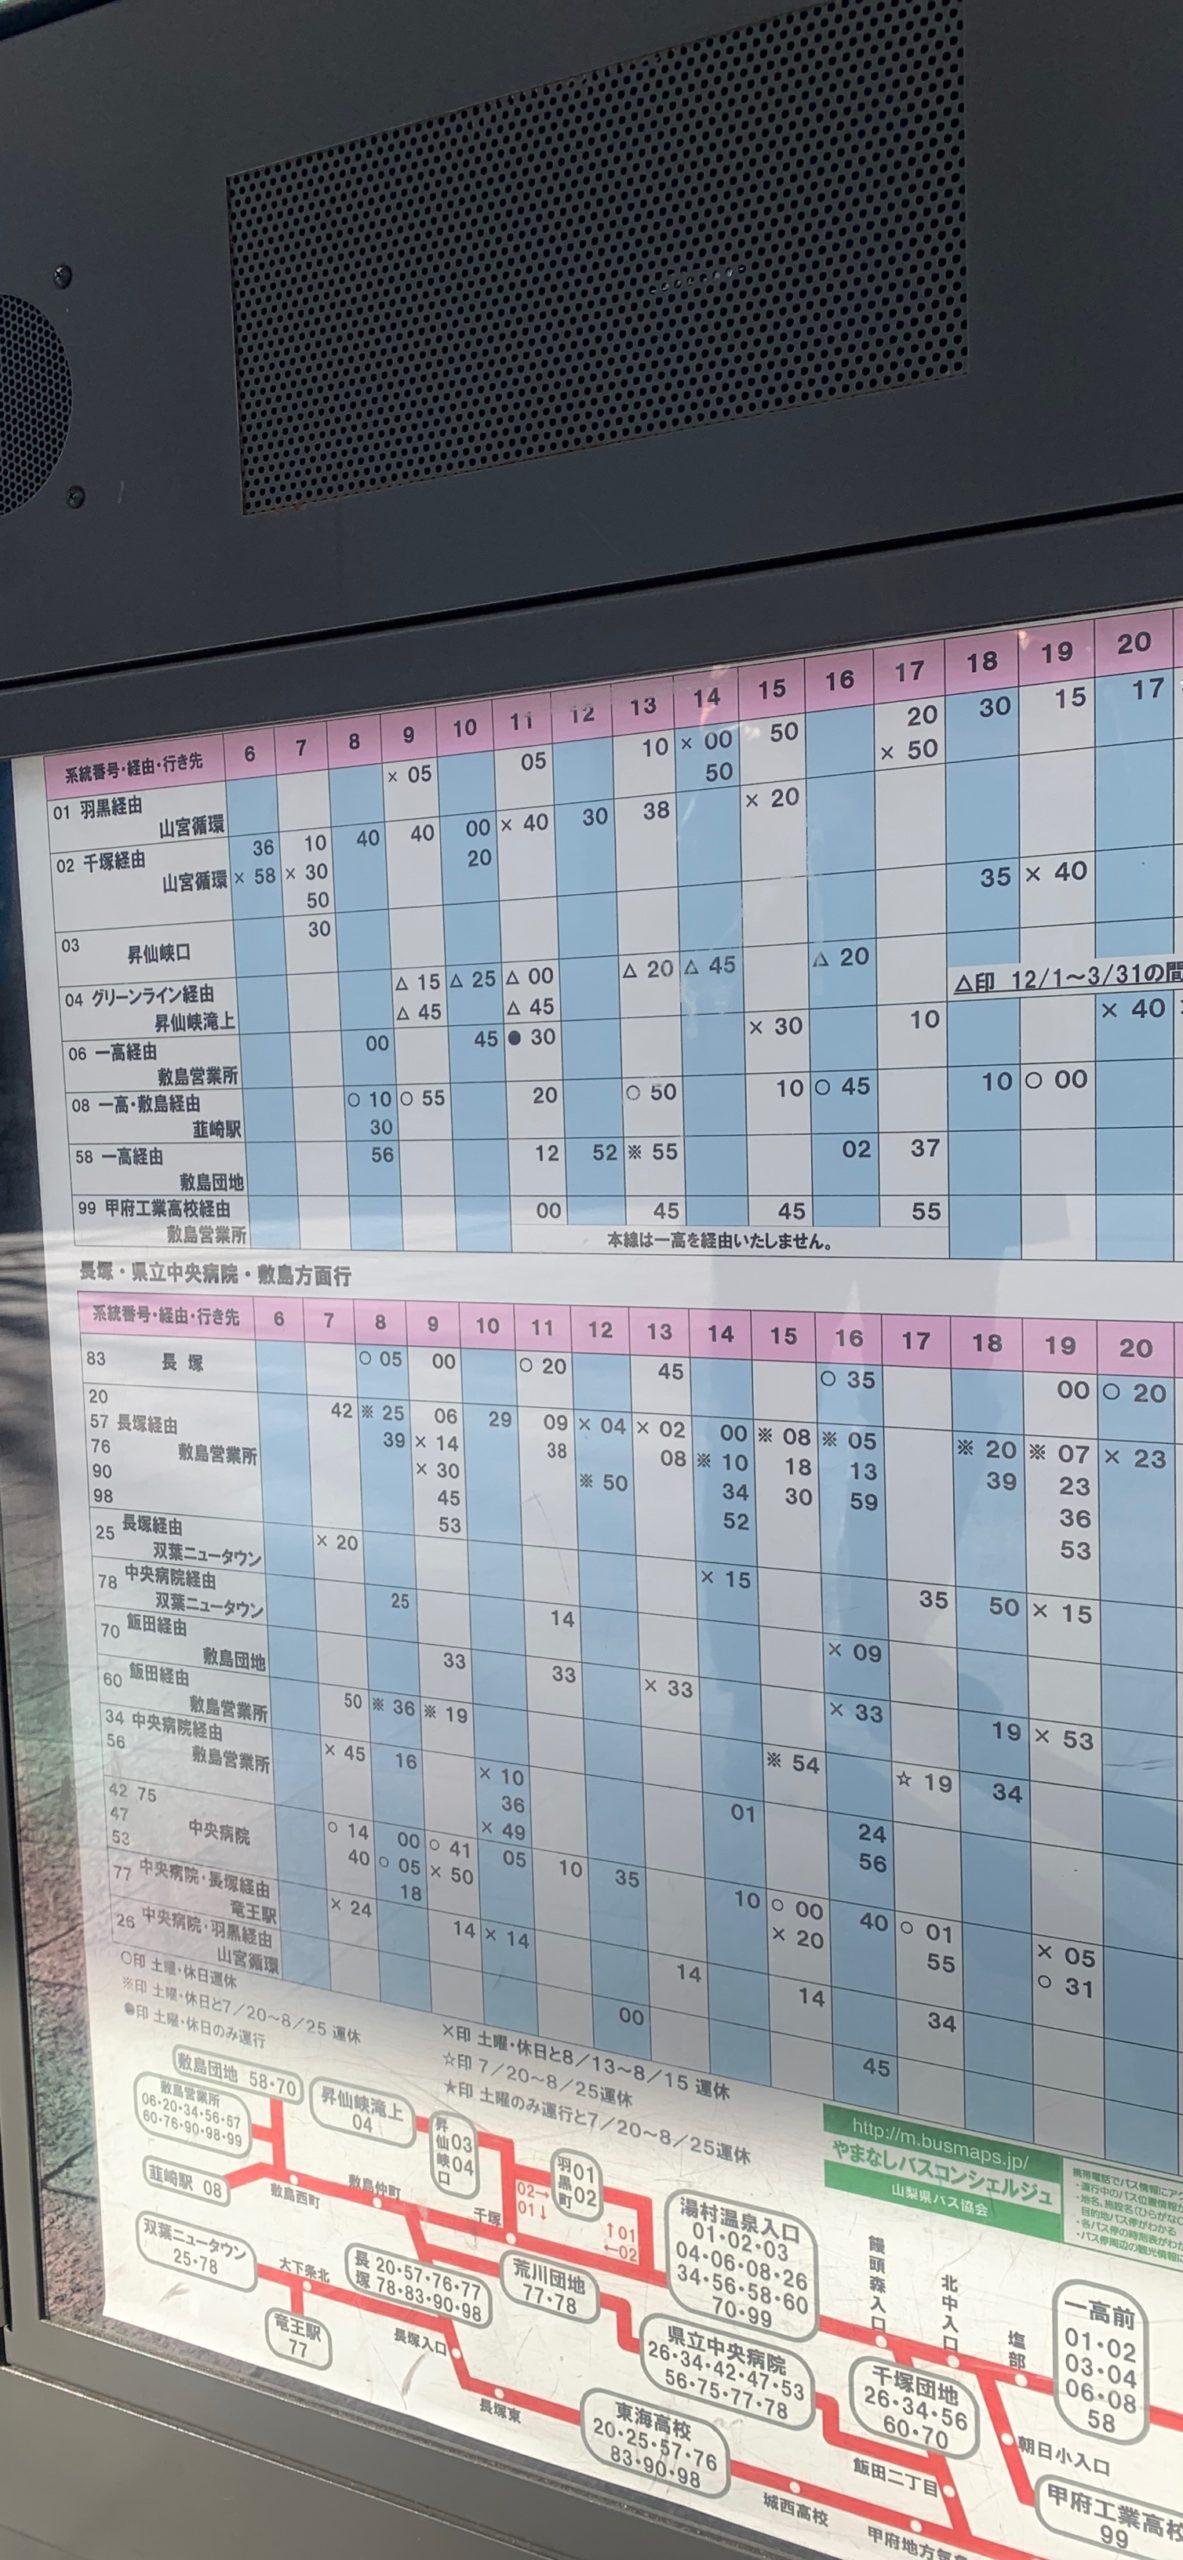 昇仙峡行きバス時刻表甲府駅南口